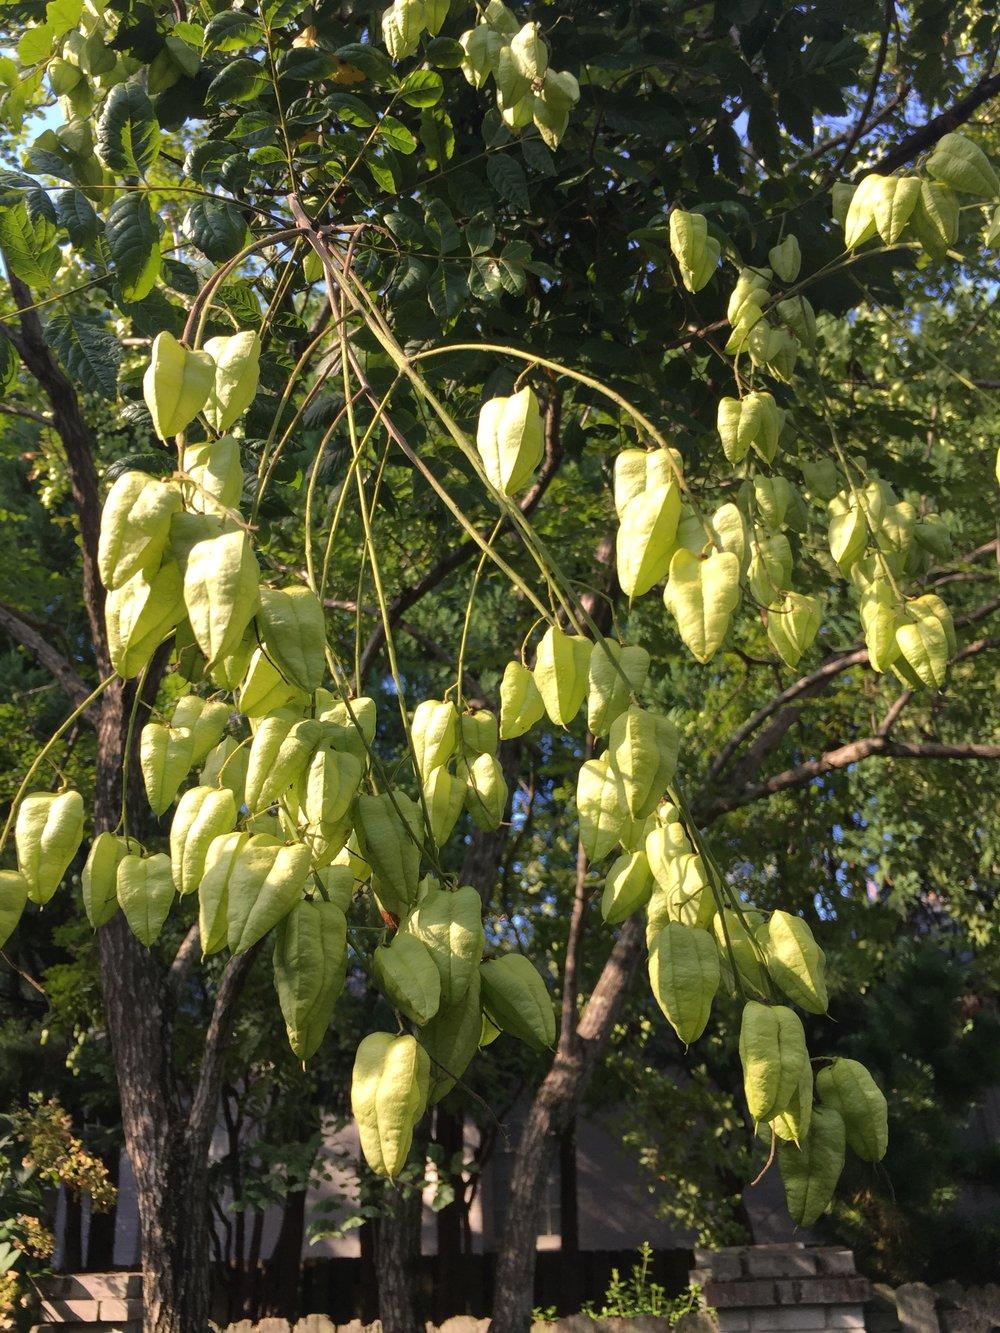 Goldenrain tree seedpods make great additions to cut flower arrangements.